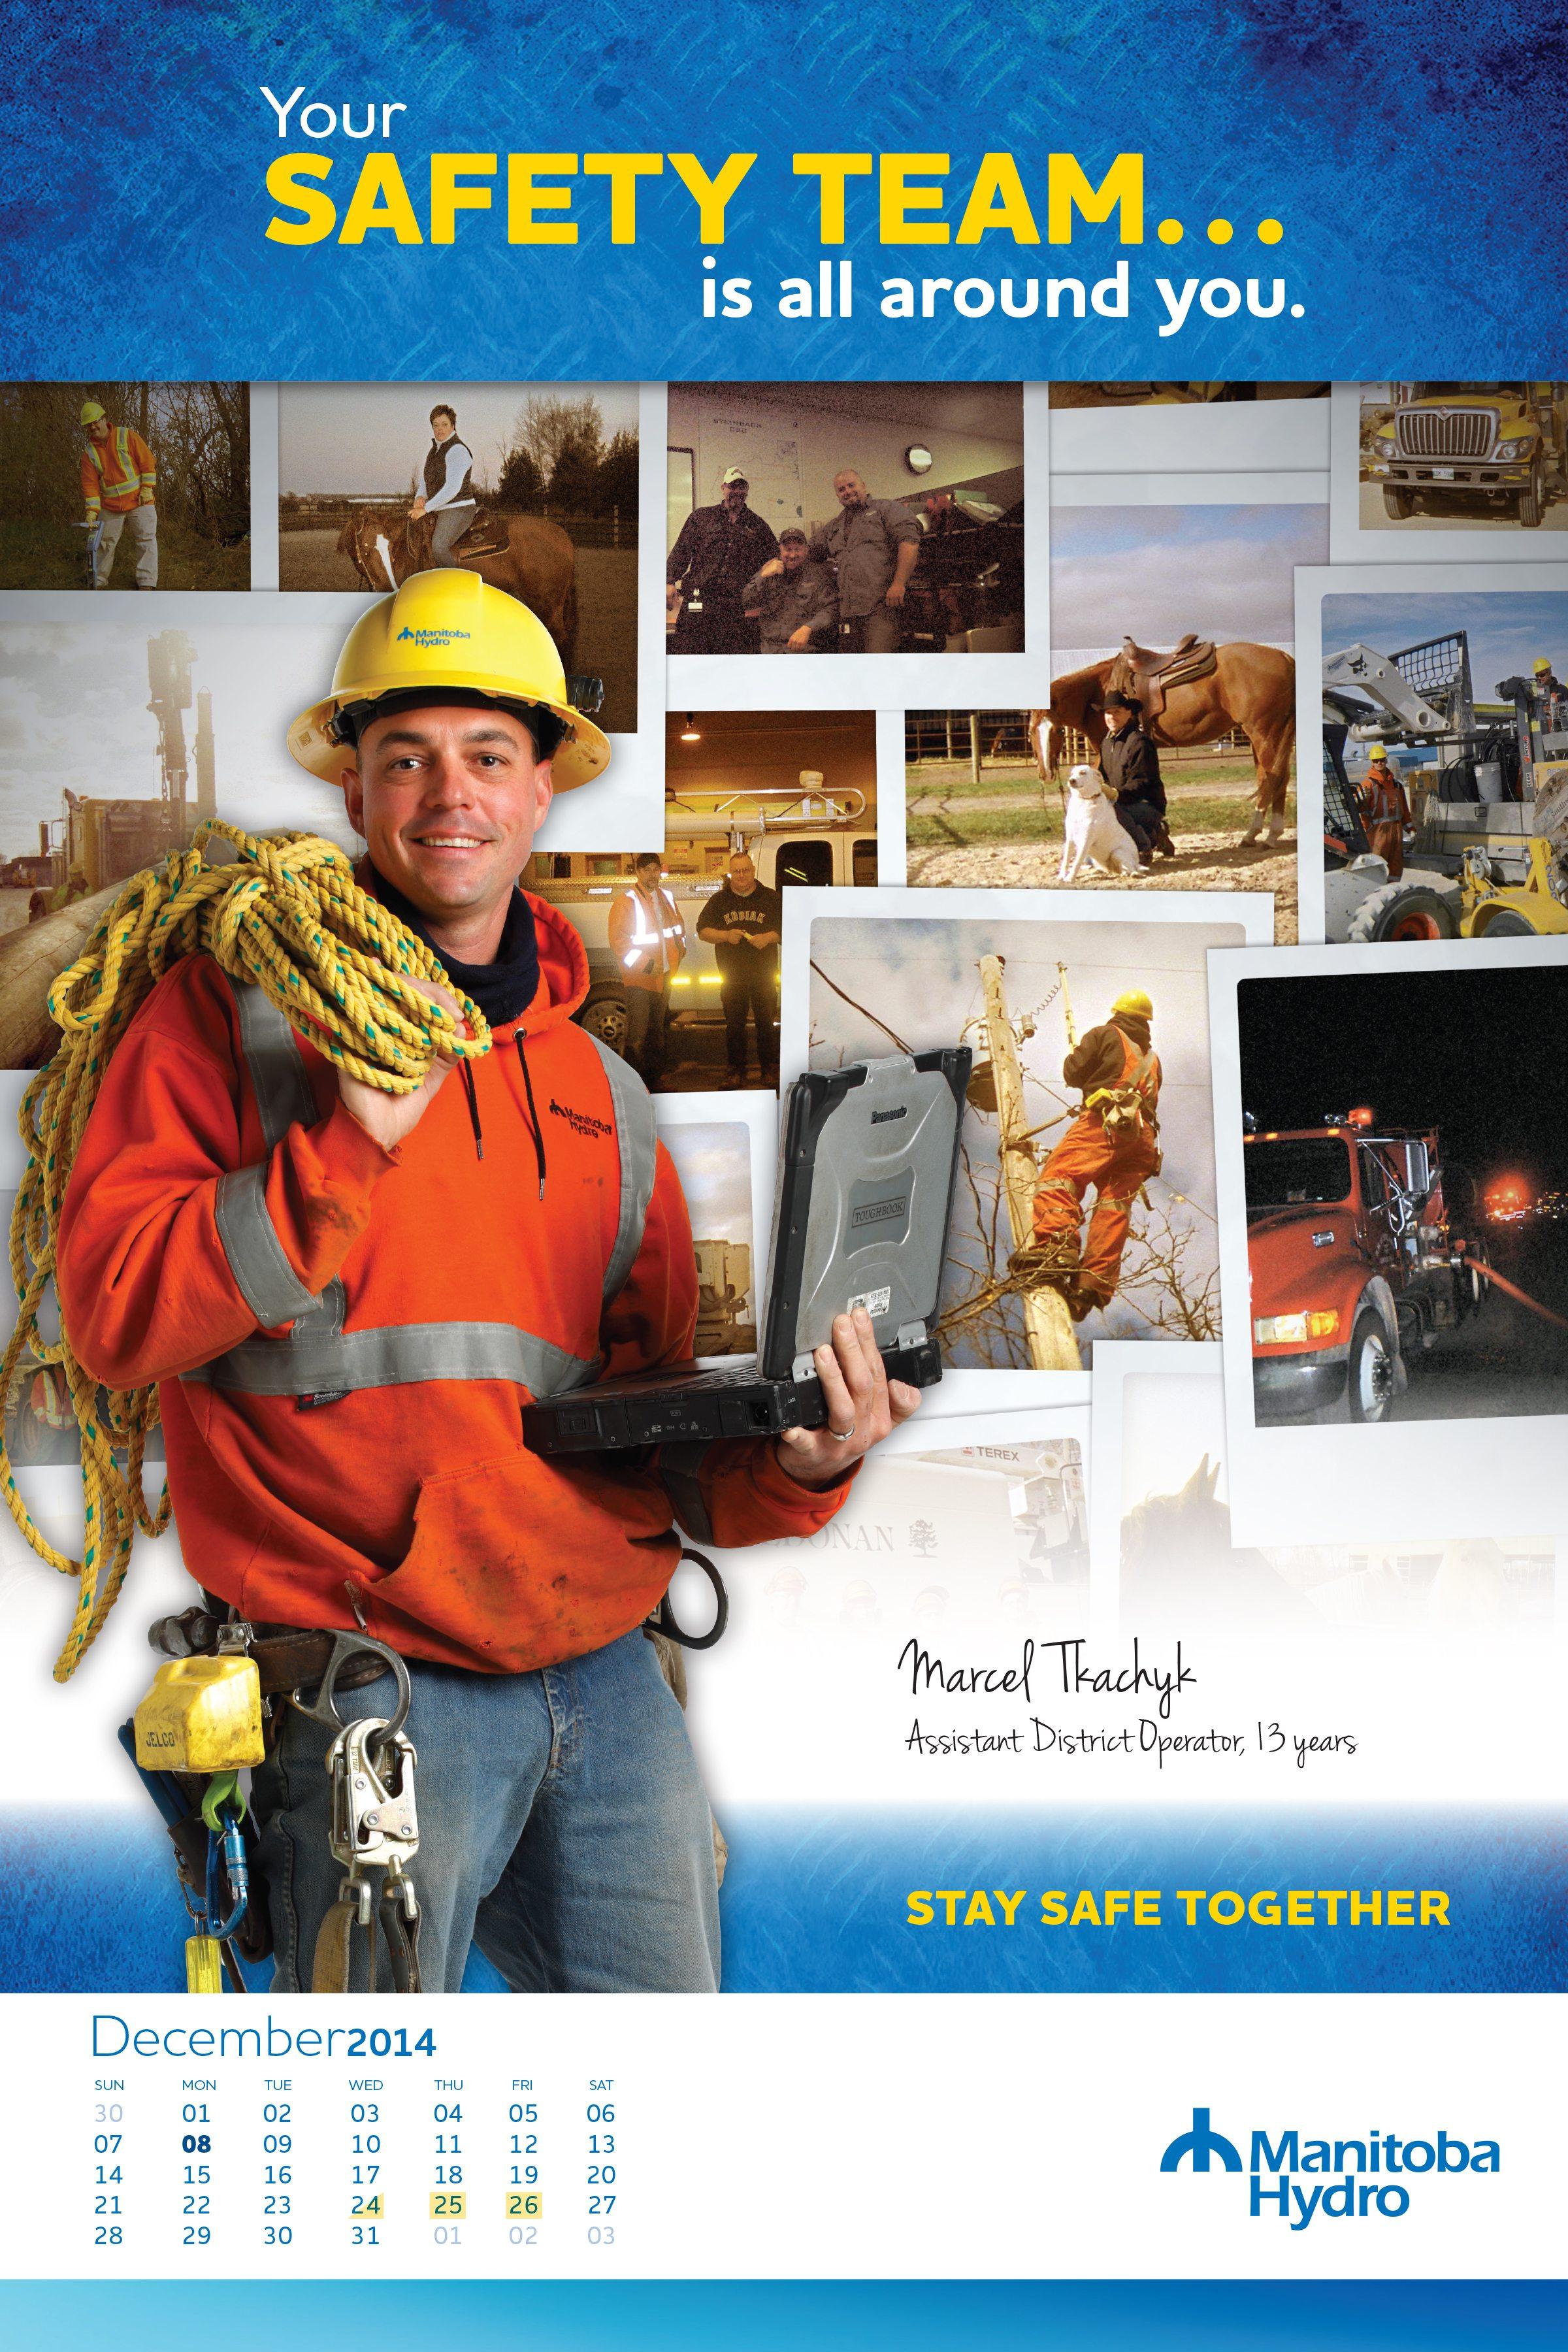 7174-tp-mbh-safety2014-calendarposter-13-highres-12